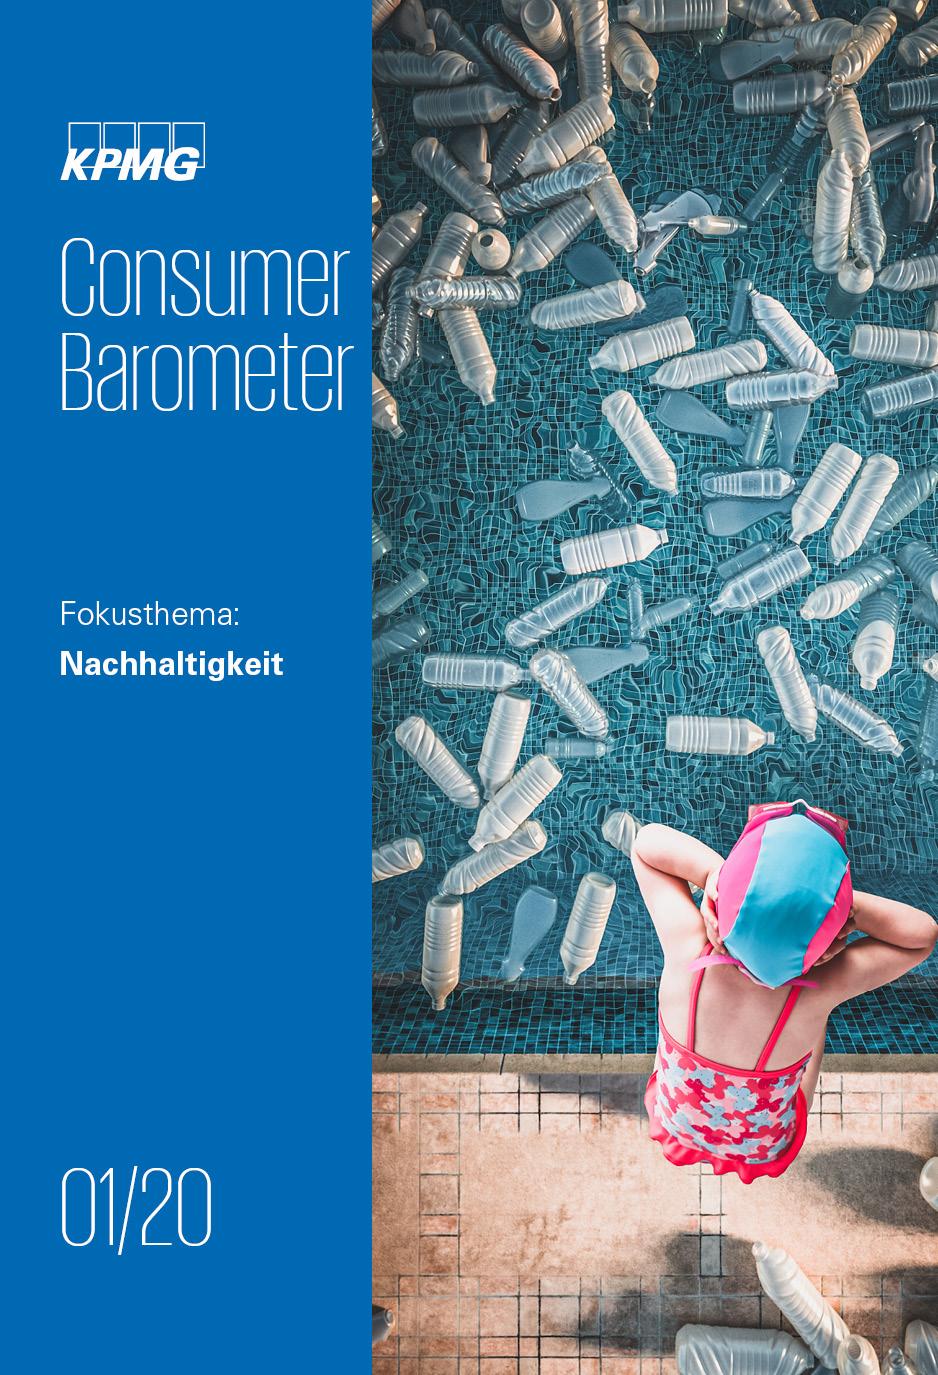 kind-vor-pool-voller-plastikflaschen-consumer-barometer-450x660